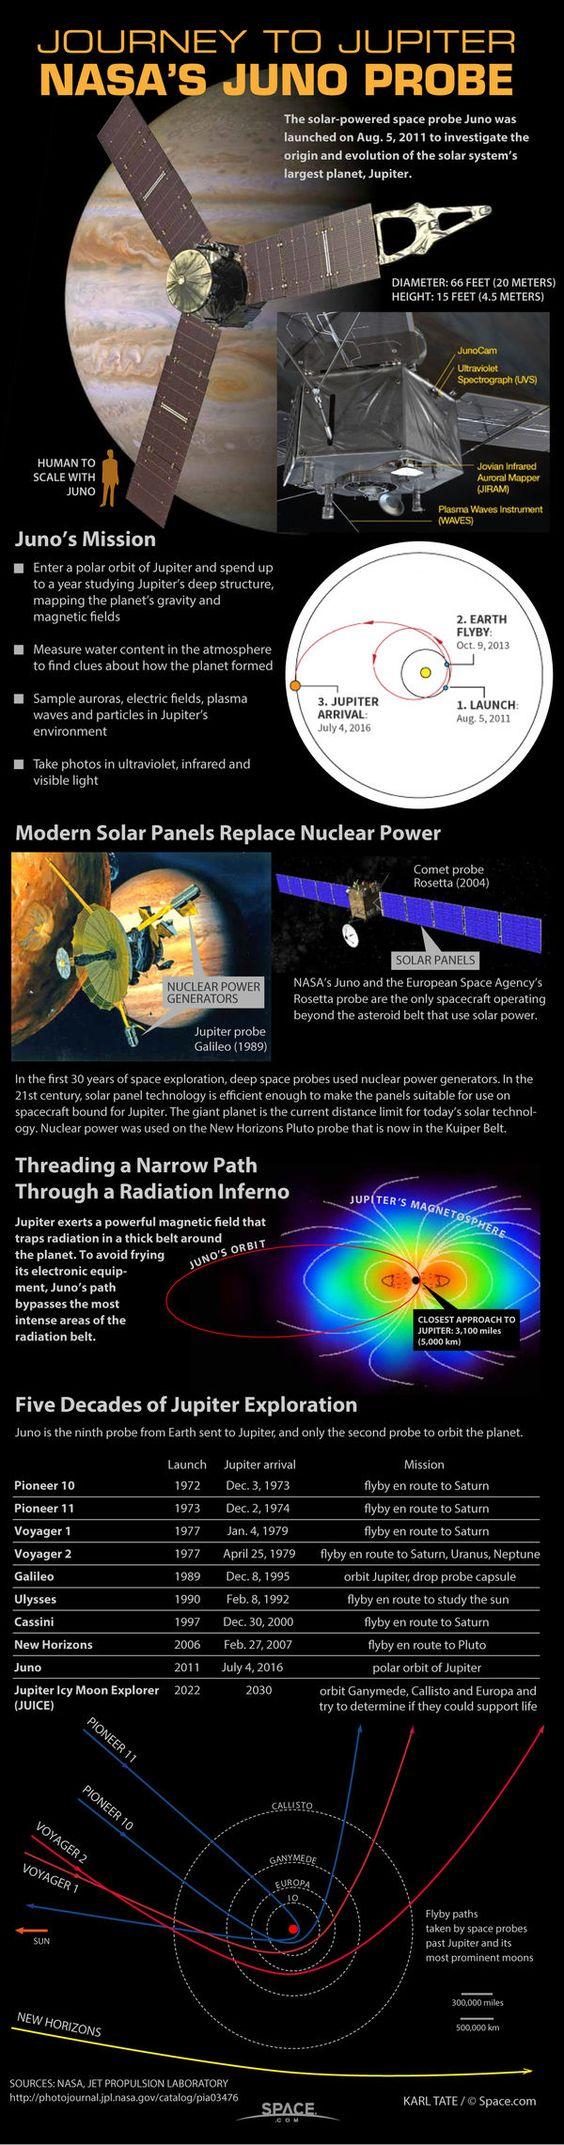 Juno Spacecraft: NASA's New Mission To Jupiter, Space.com Contributor   April 29, 2016